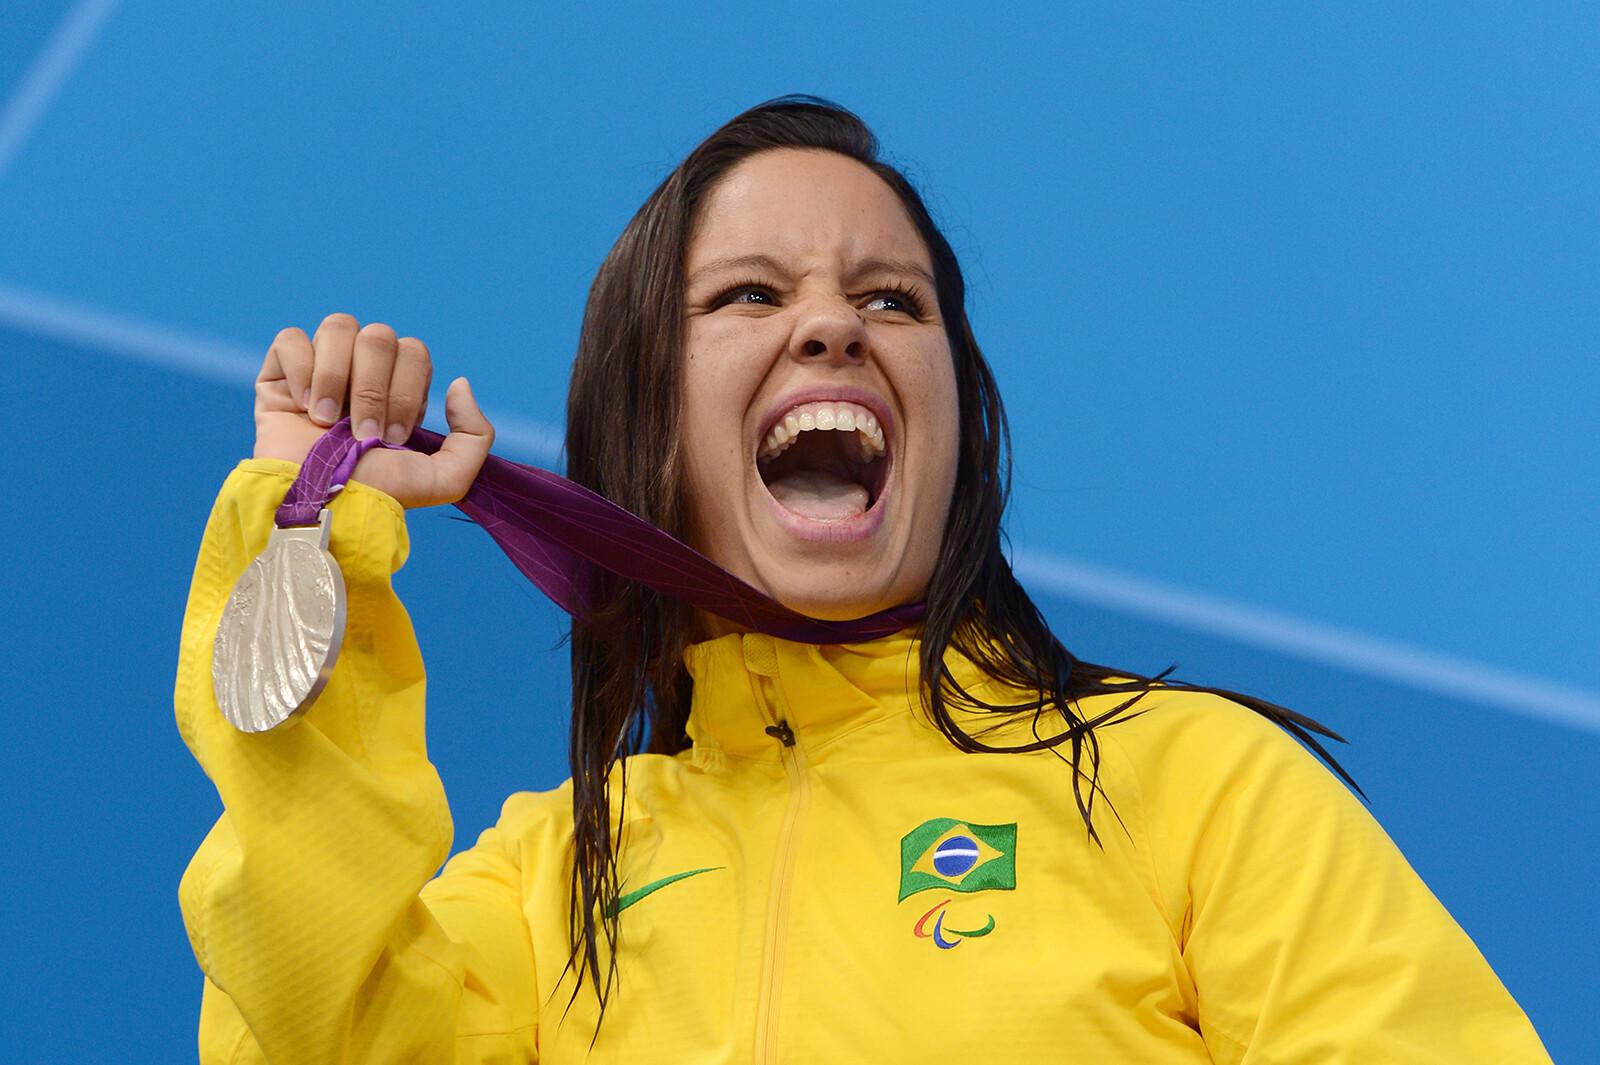 The Tokyo Paralympics may see a record-high number of LGBTQ athletes